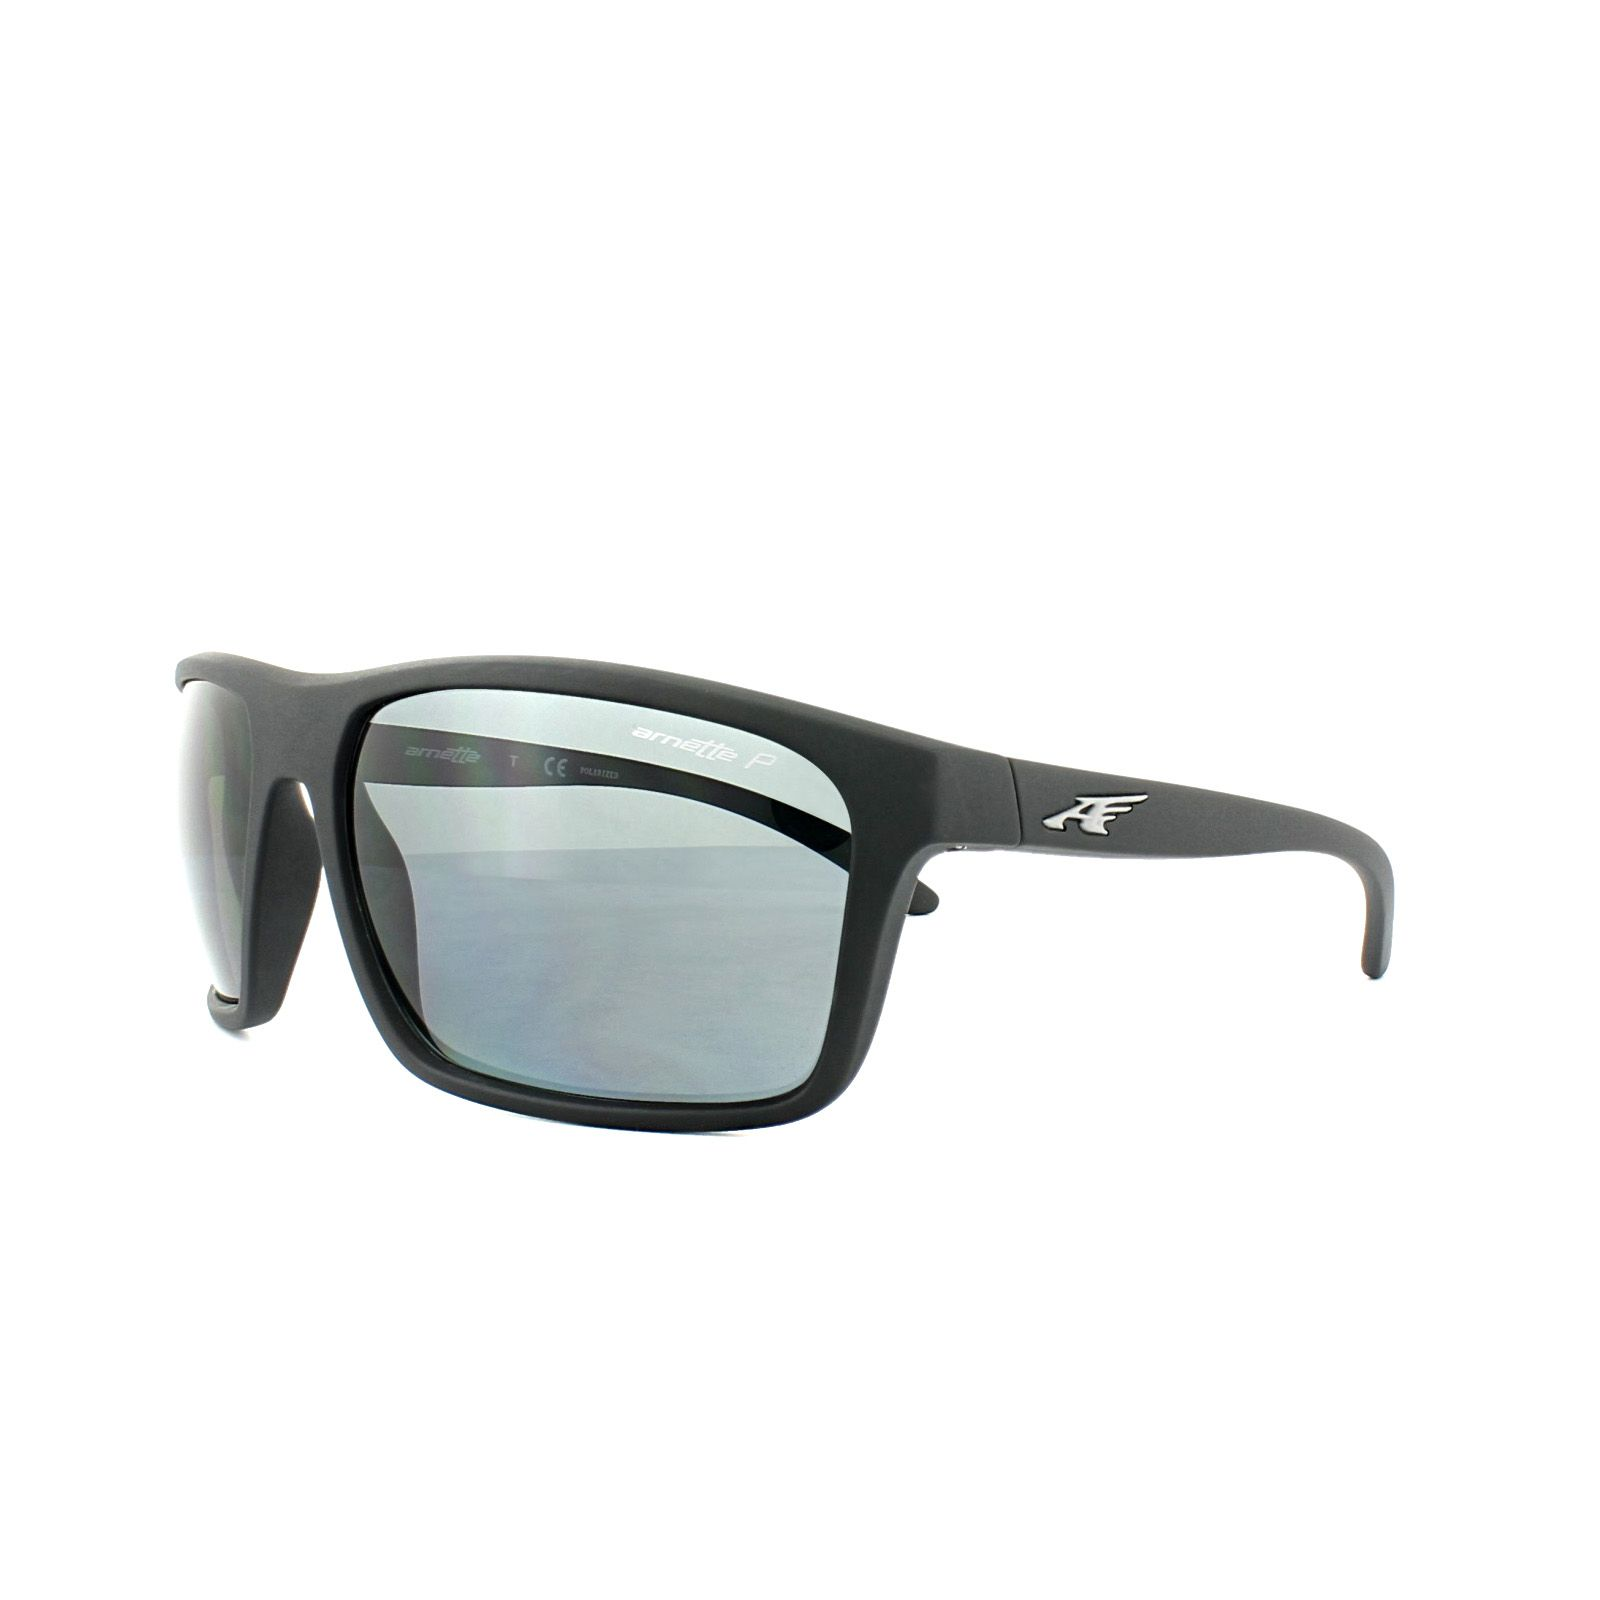 3386f95141347 Óculos de Sol Arnette Masculino Sandbank 4229-01 81 - Omega Ótica e ...